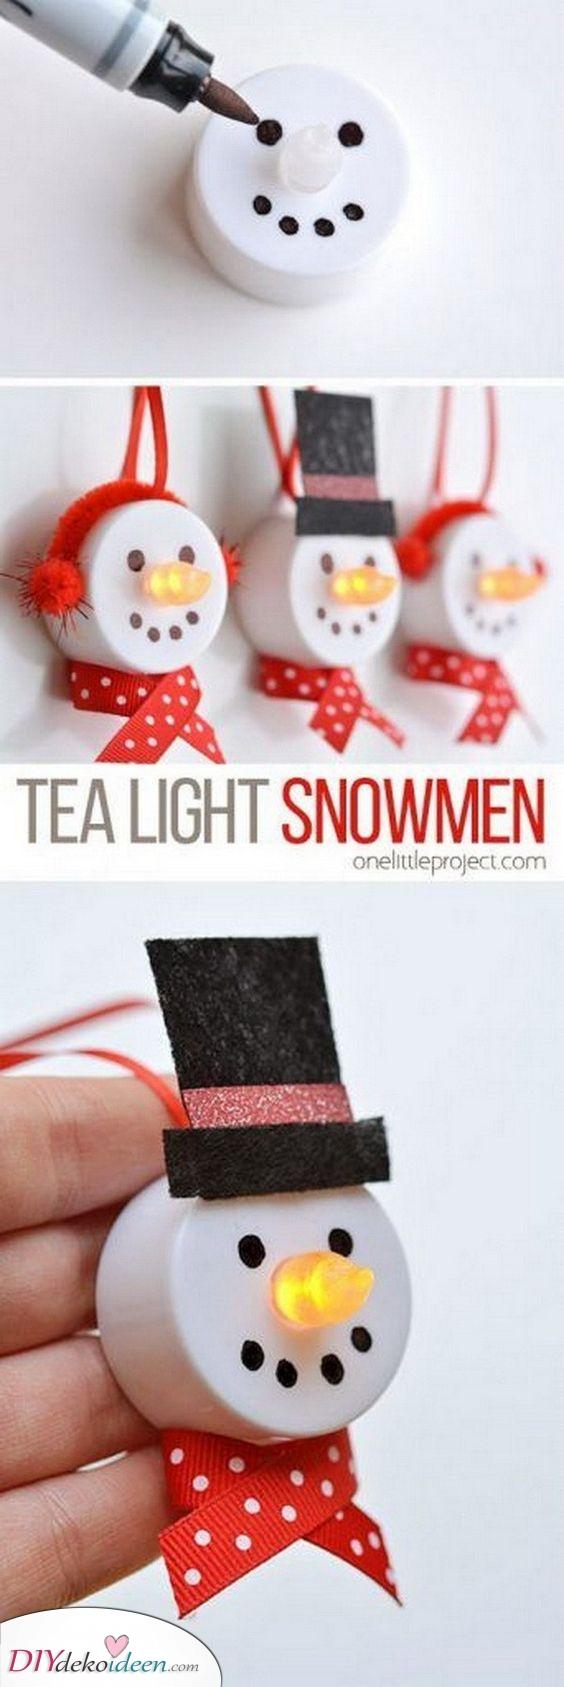 Teelicht Schneemänner – So süß